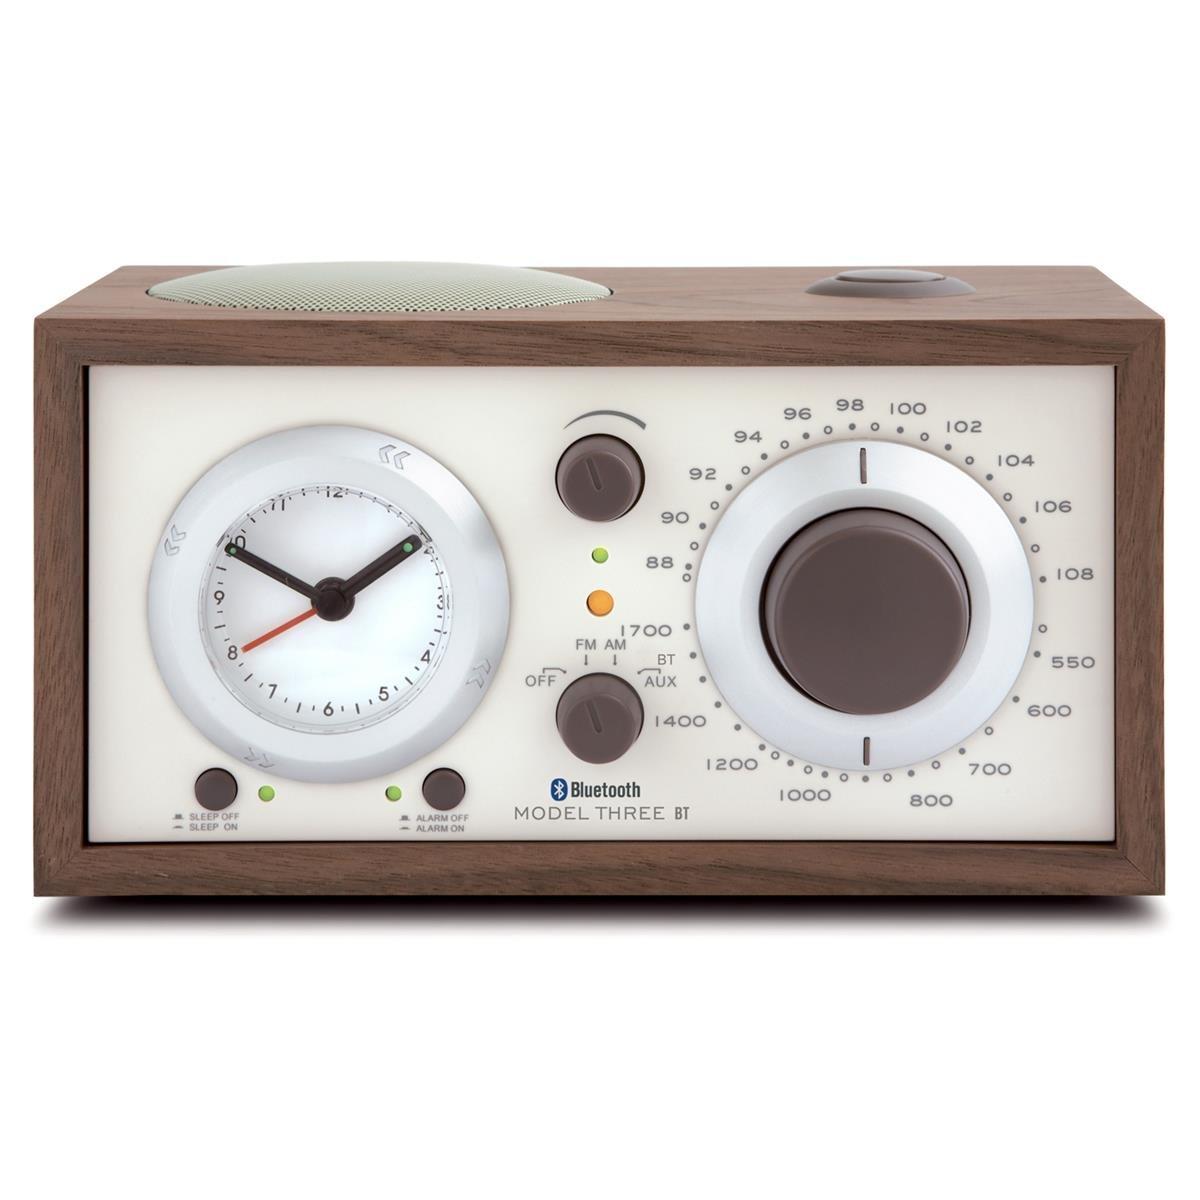 Tivoli Audio - Model Three BT AM/FM Clock Radio with Bluetooth - Walnut and Beige by Tivoli Audio